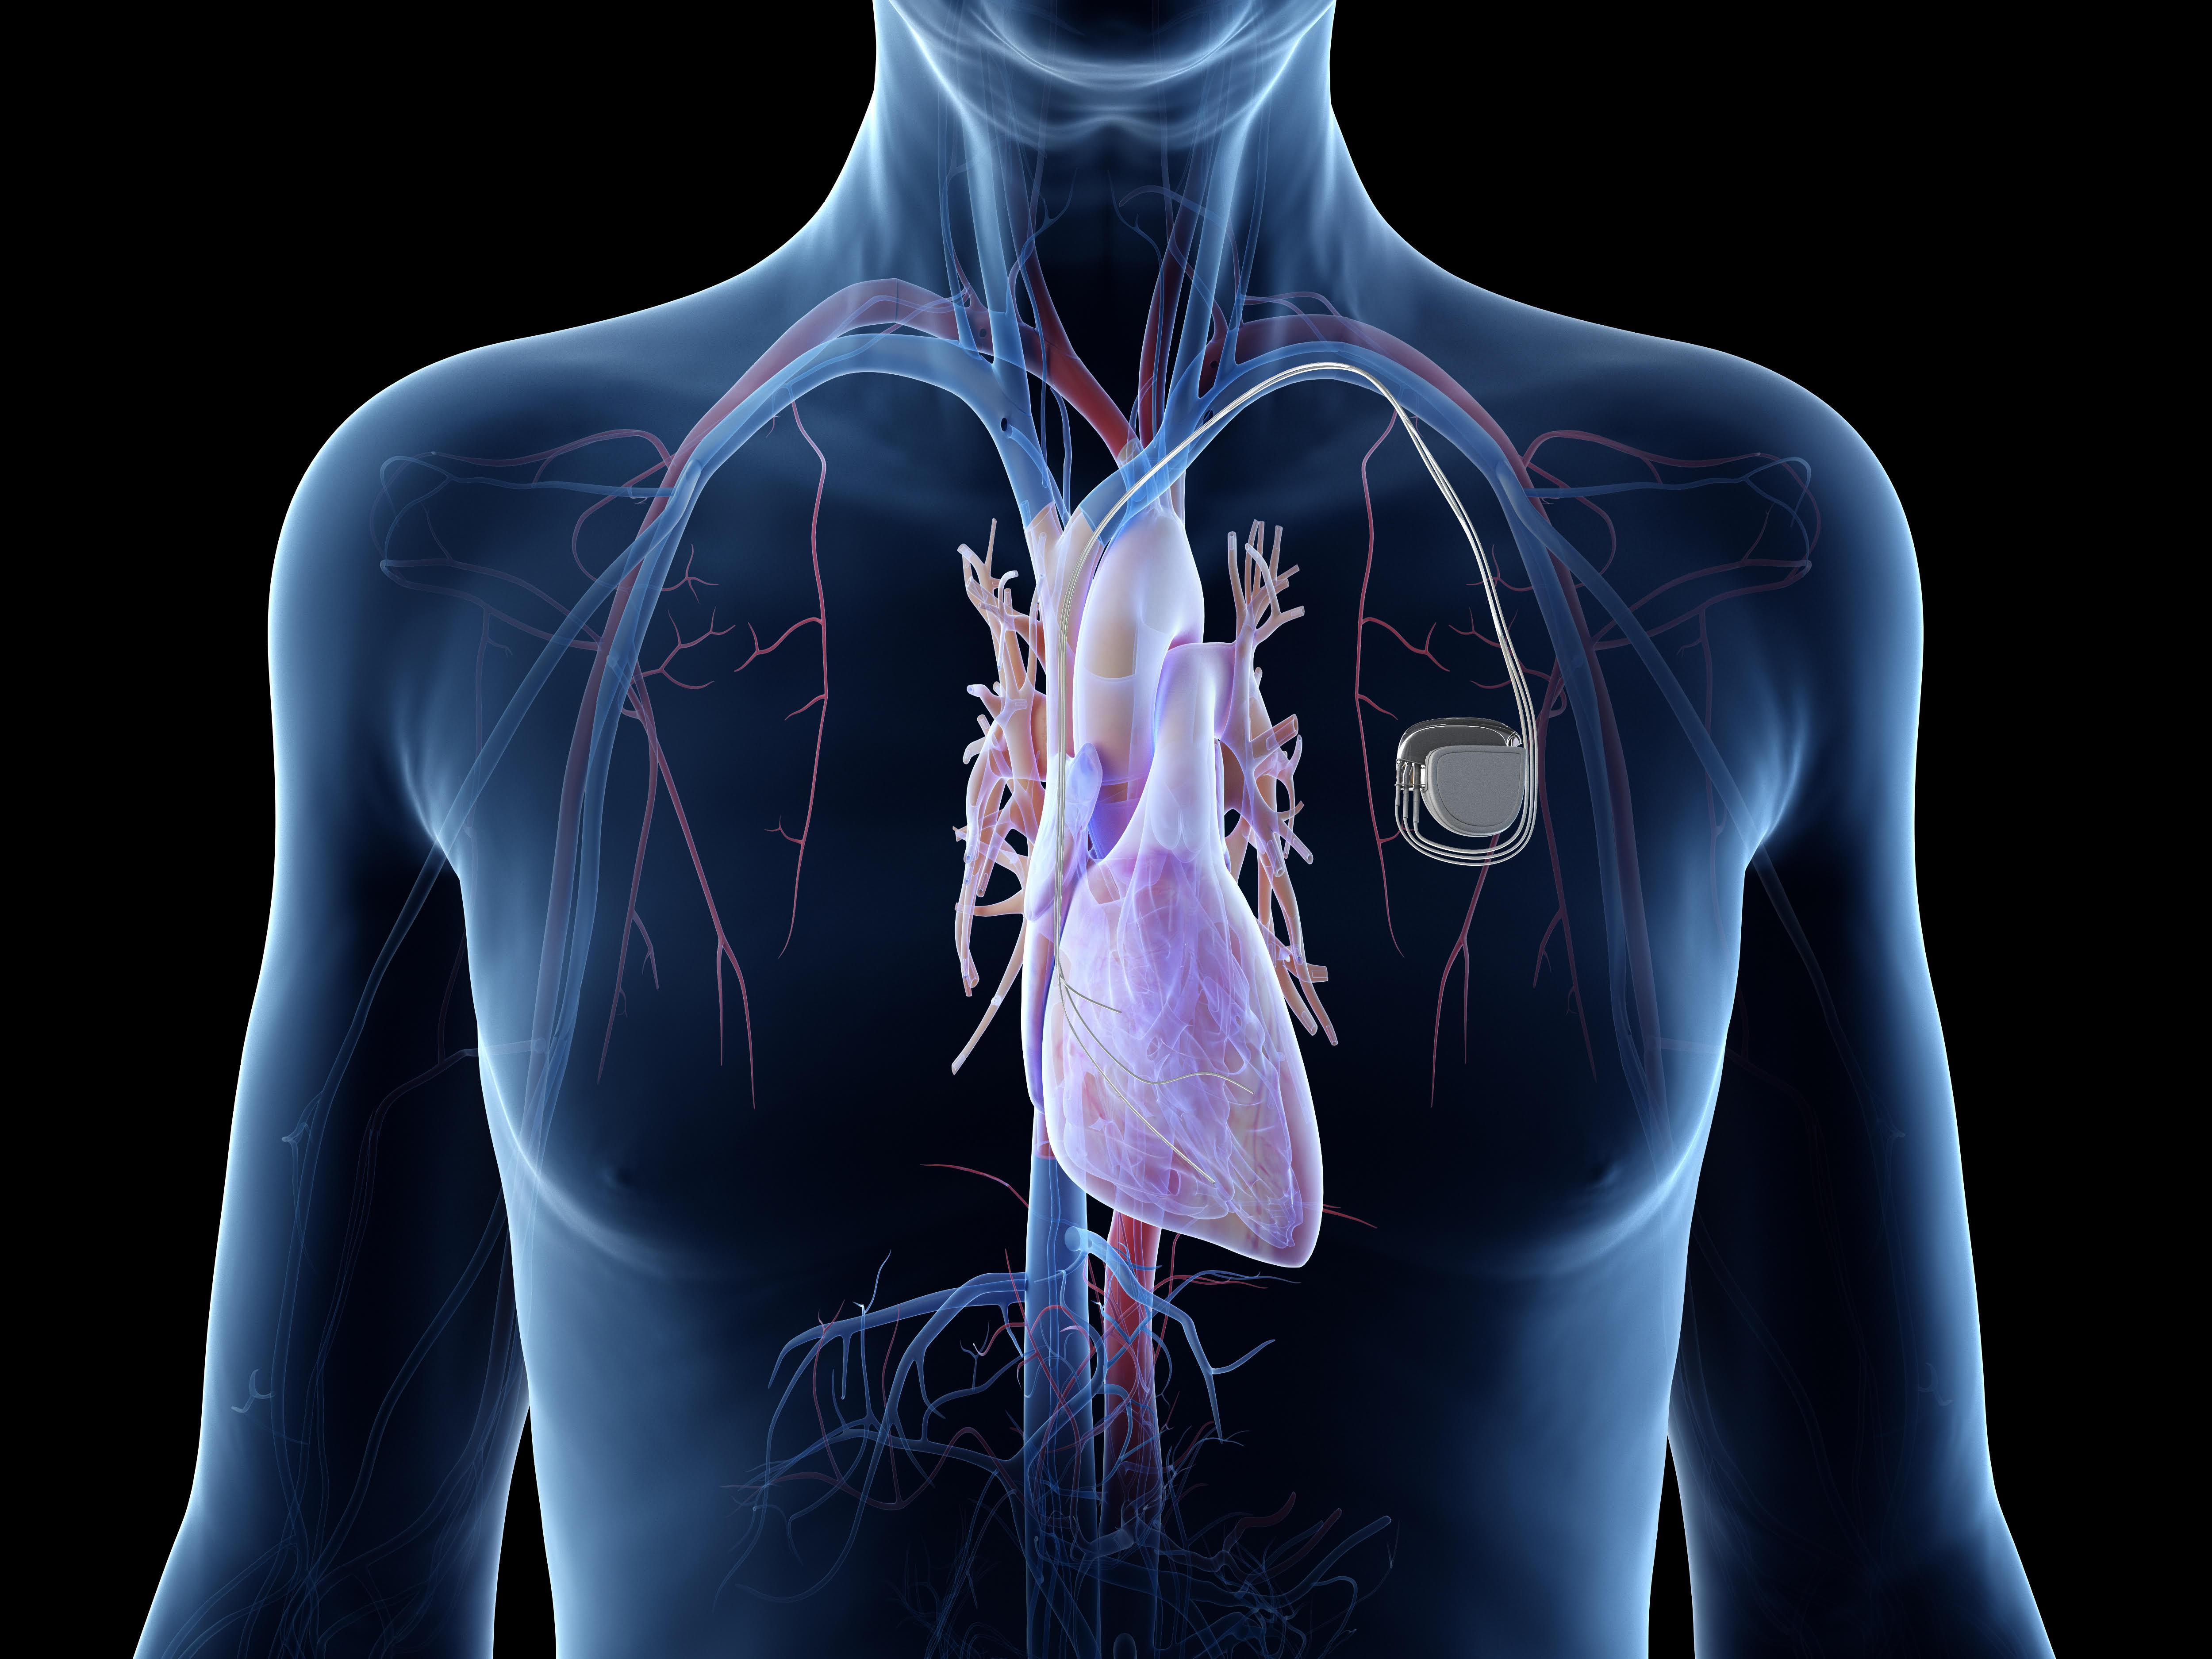 grafika kardiostimulátora v tele pacienta